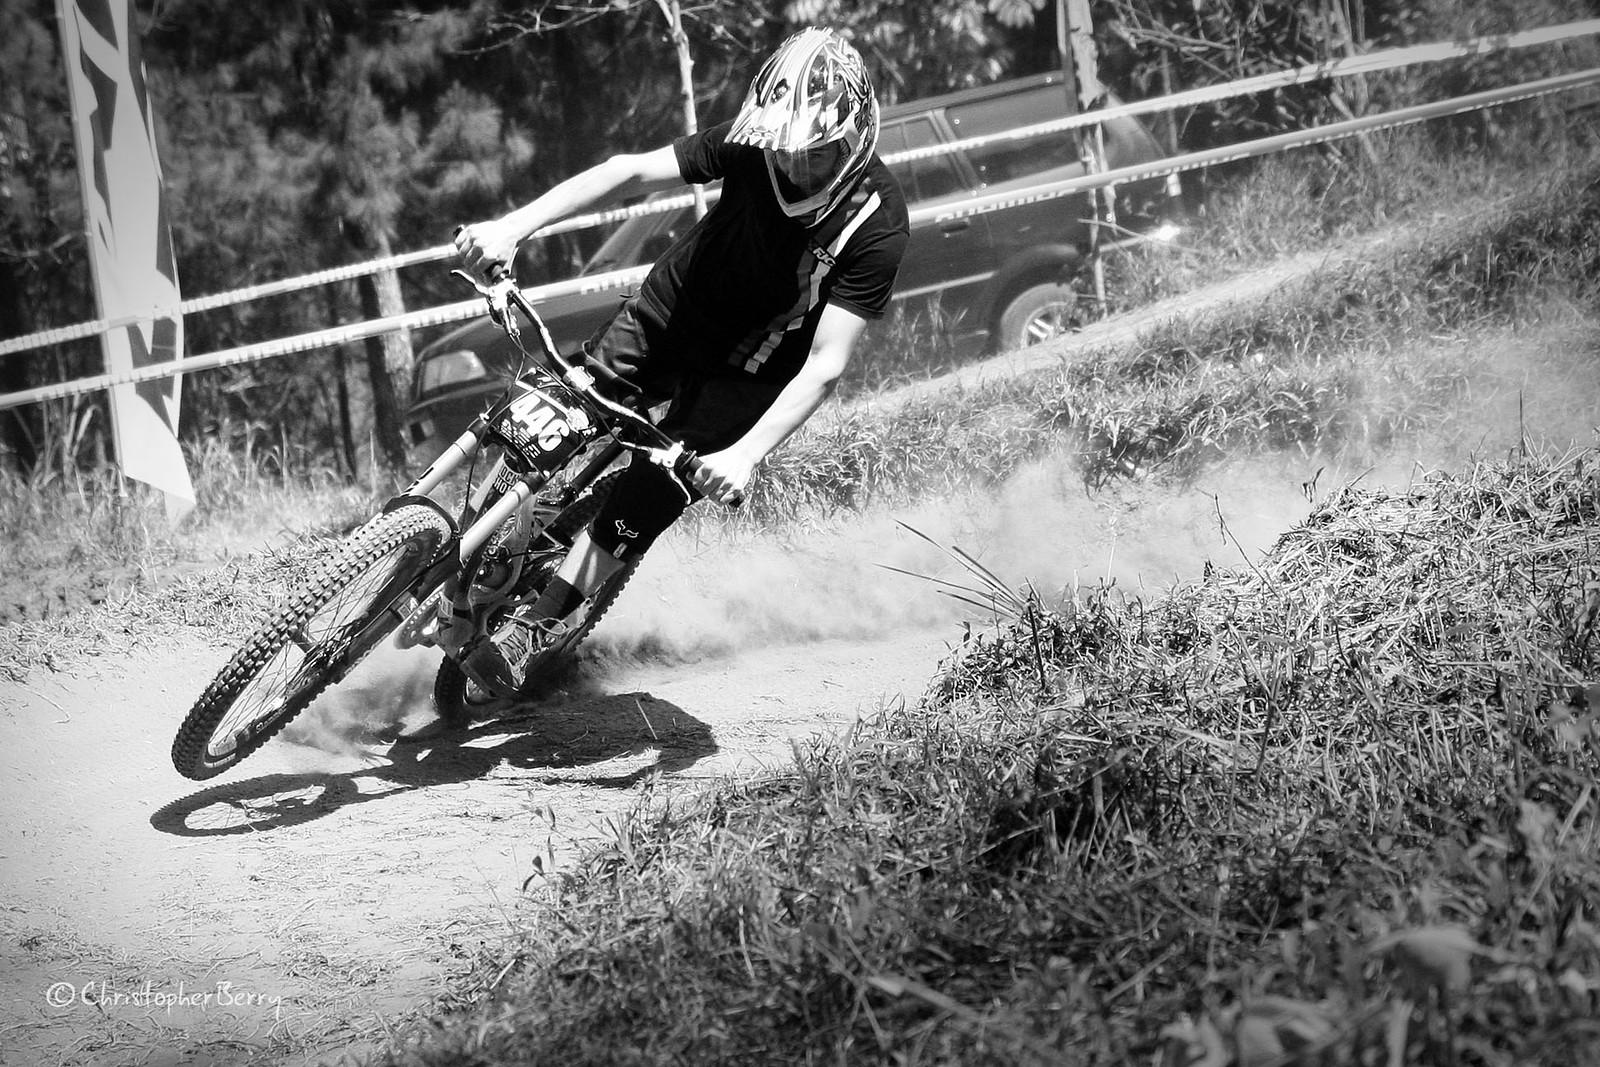 ShimanoUKDIseri02 - 0620 -mod BW - ombei - Mountain Biking Pictures - Vital MTB